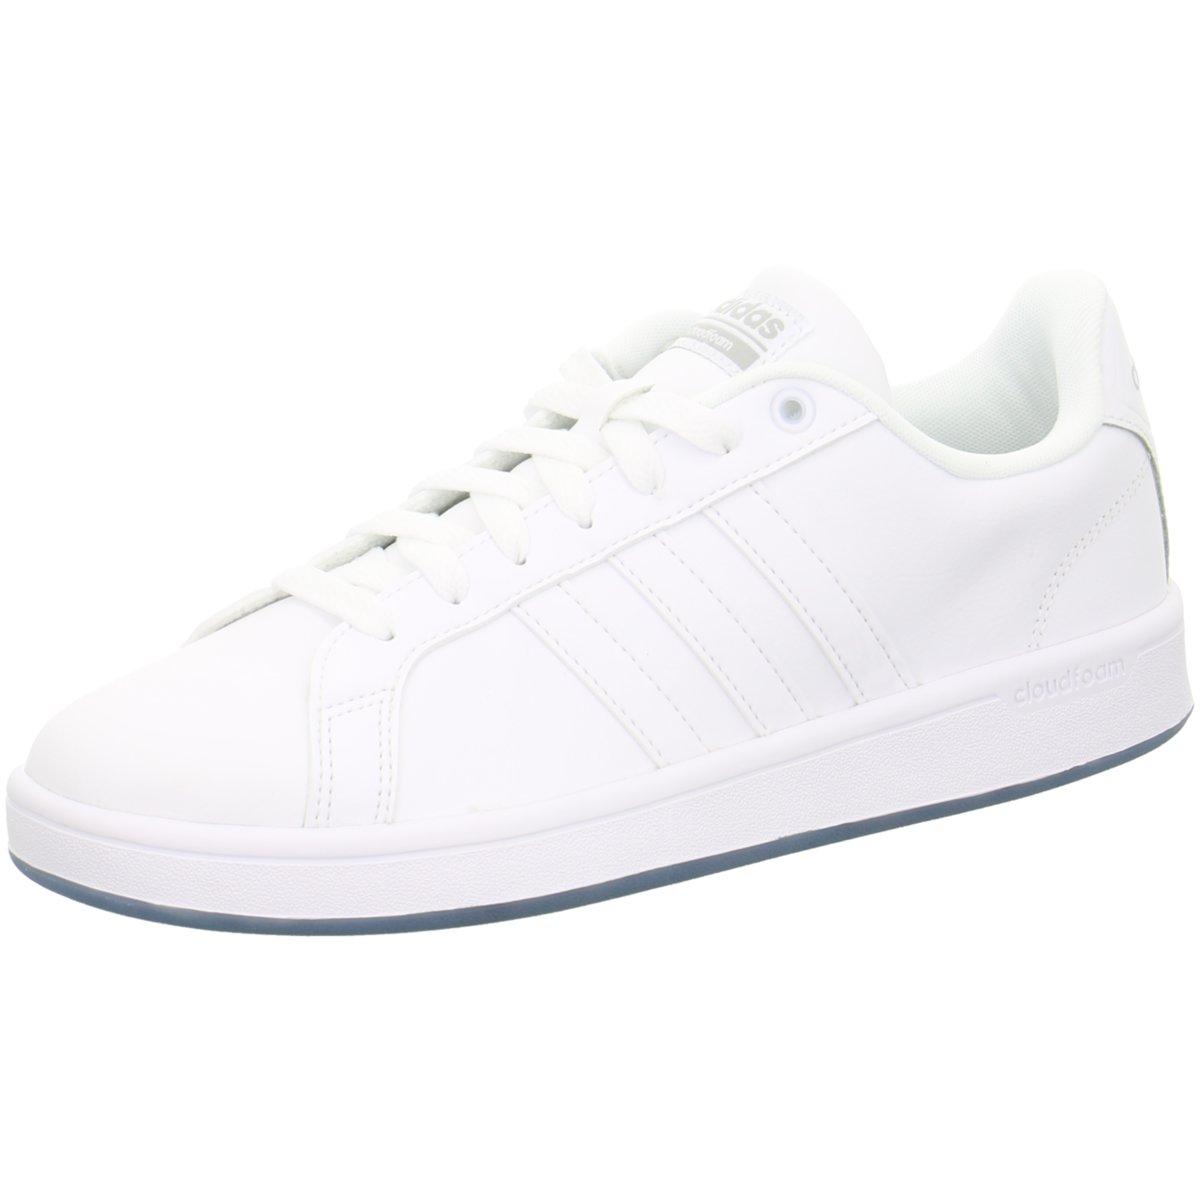 Adidas Neo Angebote Herren Cf Advantage Cl Sneakers Weiß